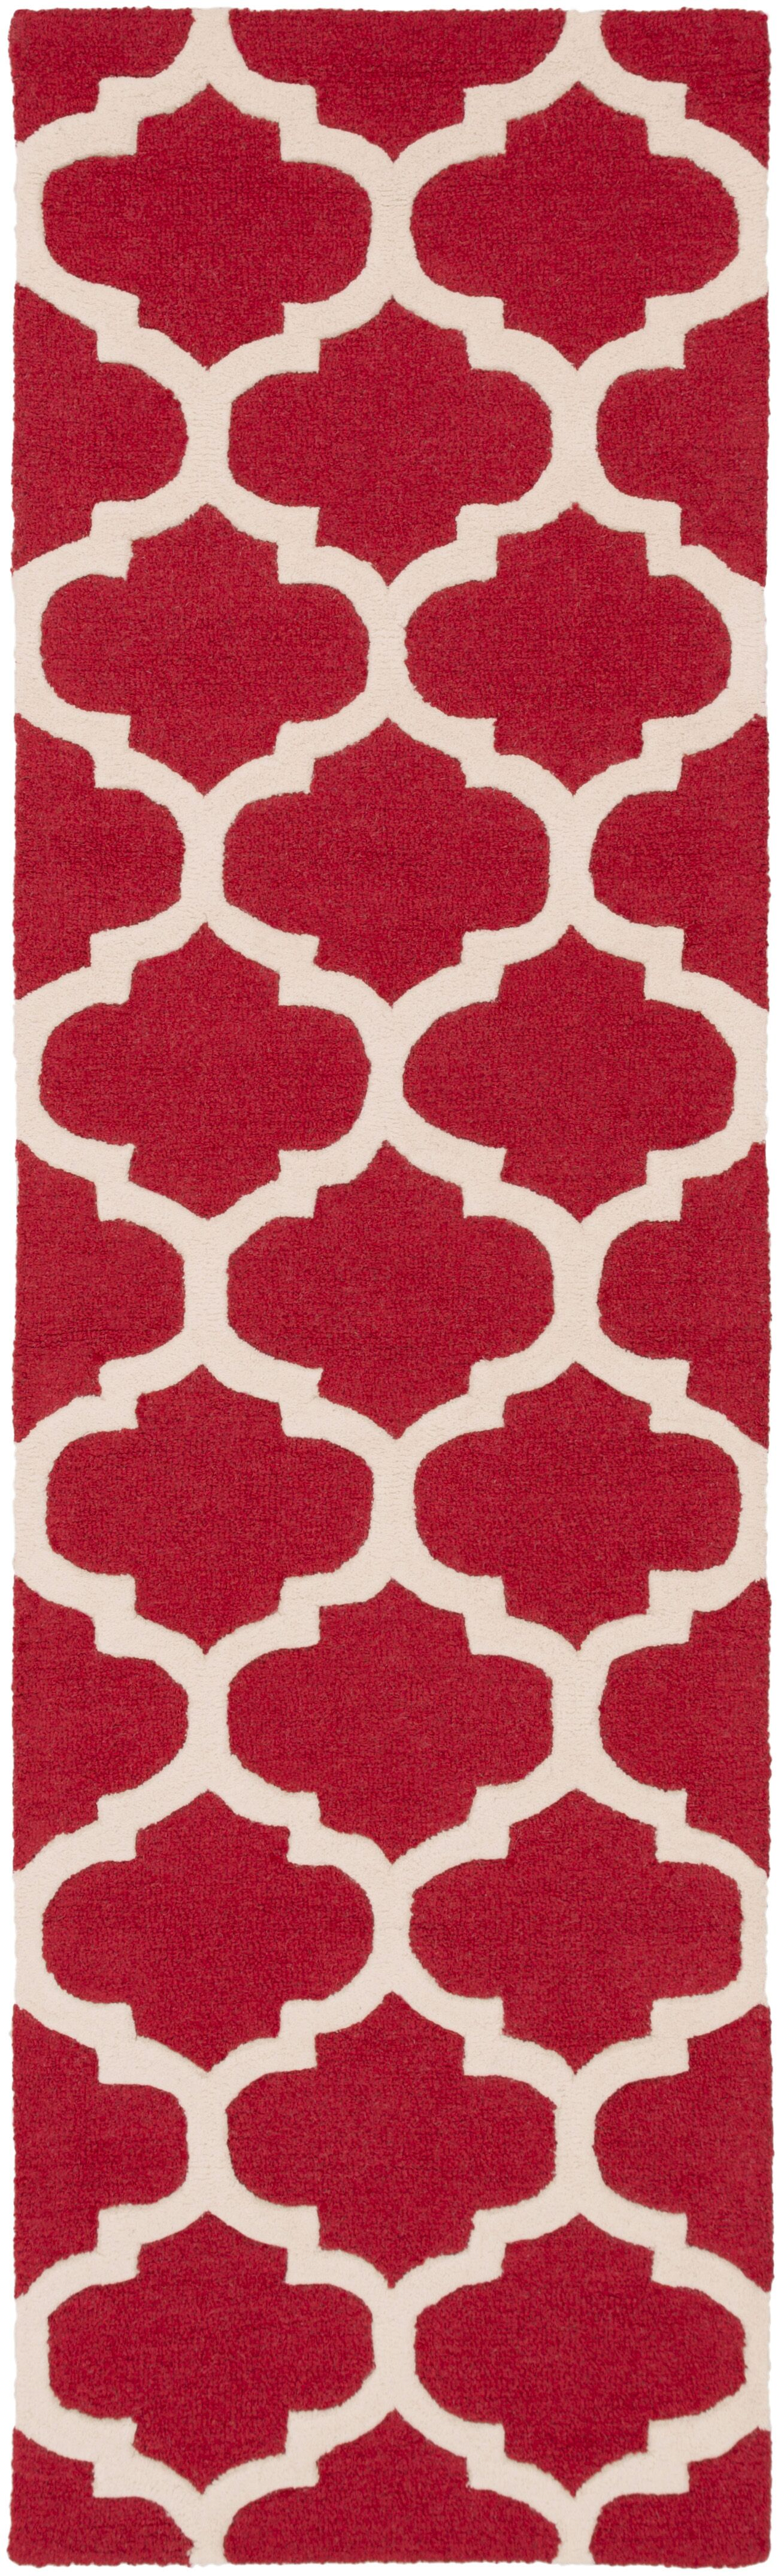 Blaisdell Red Geometric Stella Area Rug Rug Size: Runner 2'3